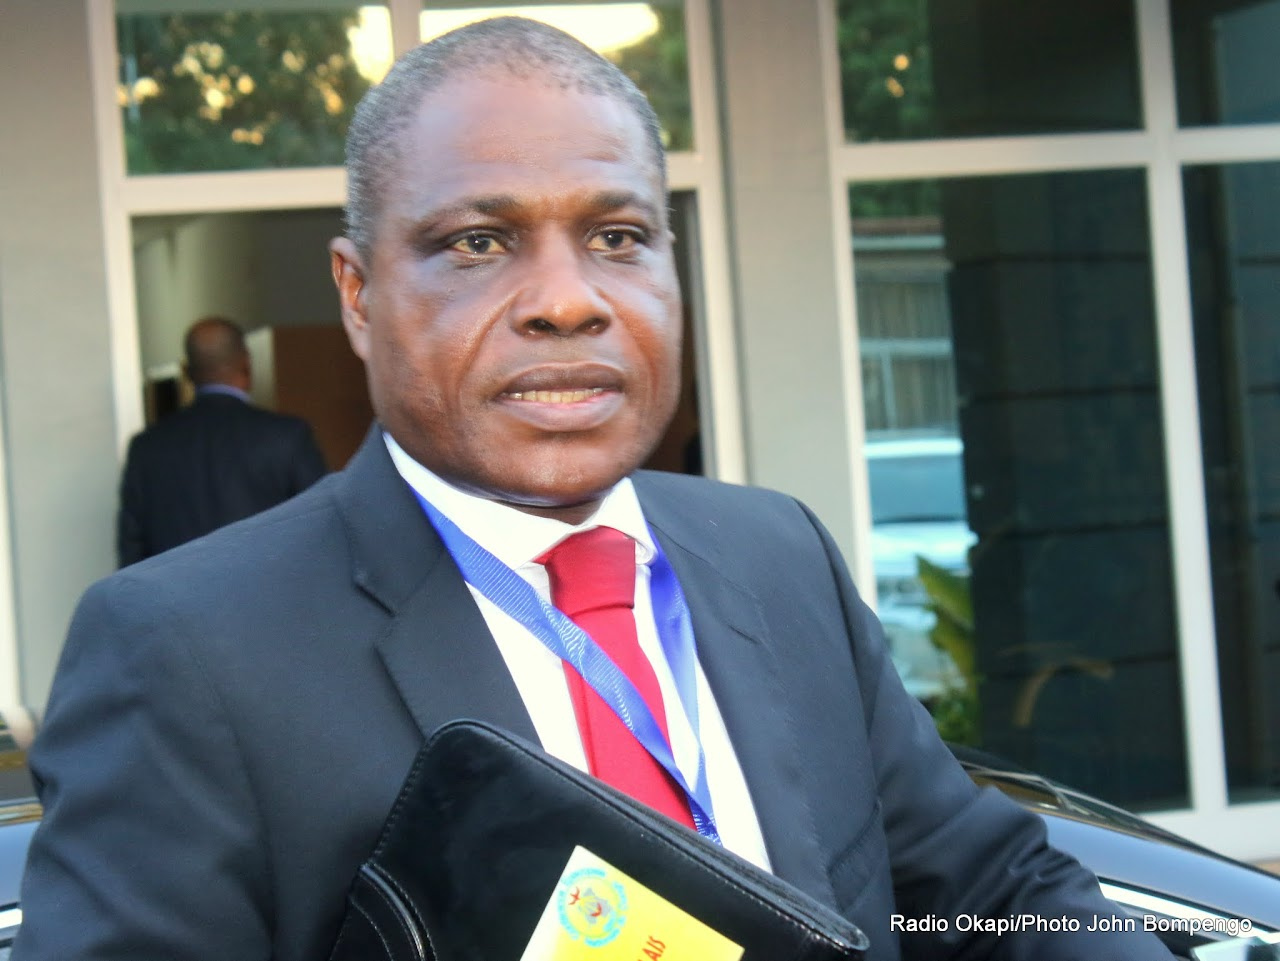 Parlement : les mandats de Martin Fayulu, Olivier Kamitatu et Francis Kalombo invalidés